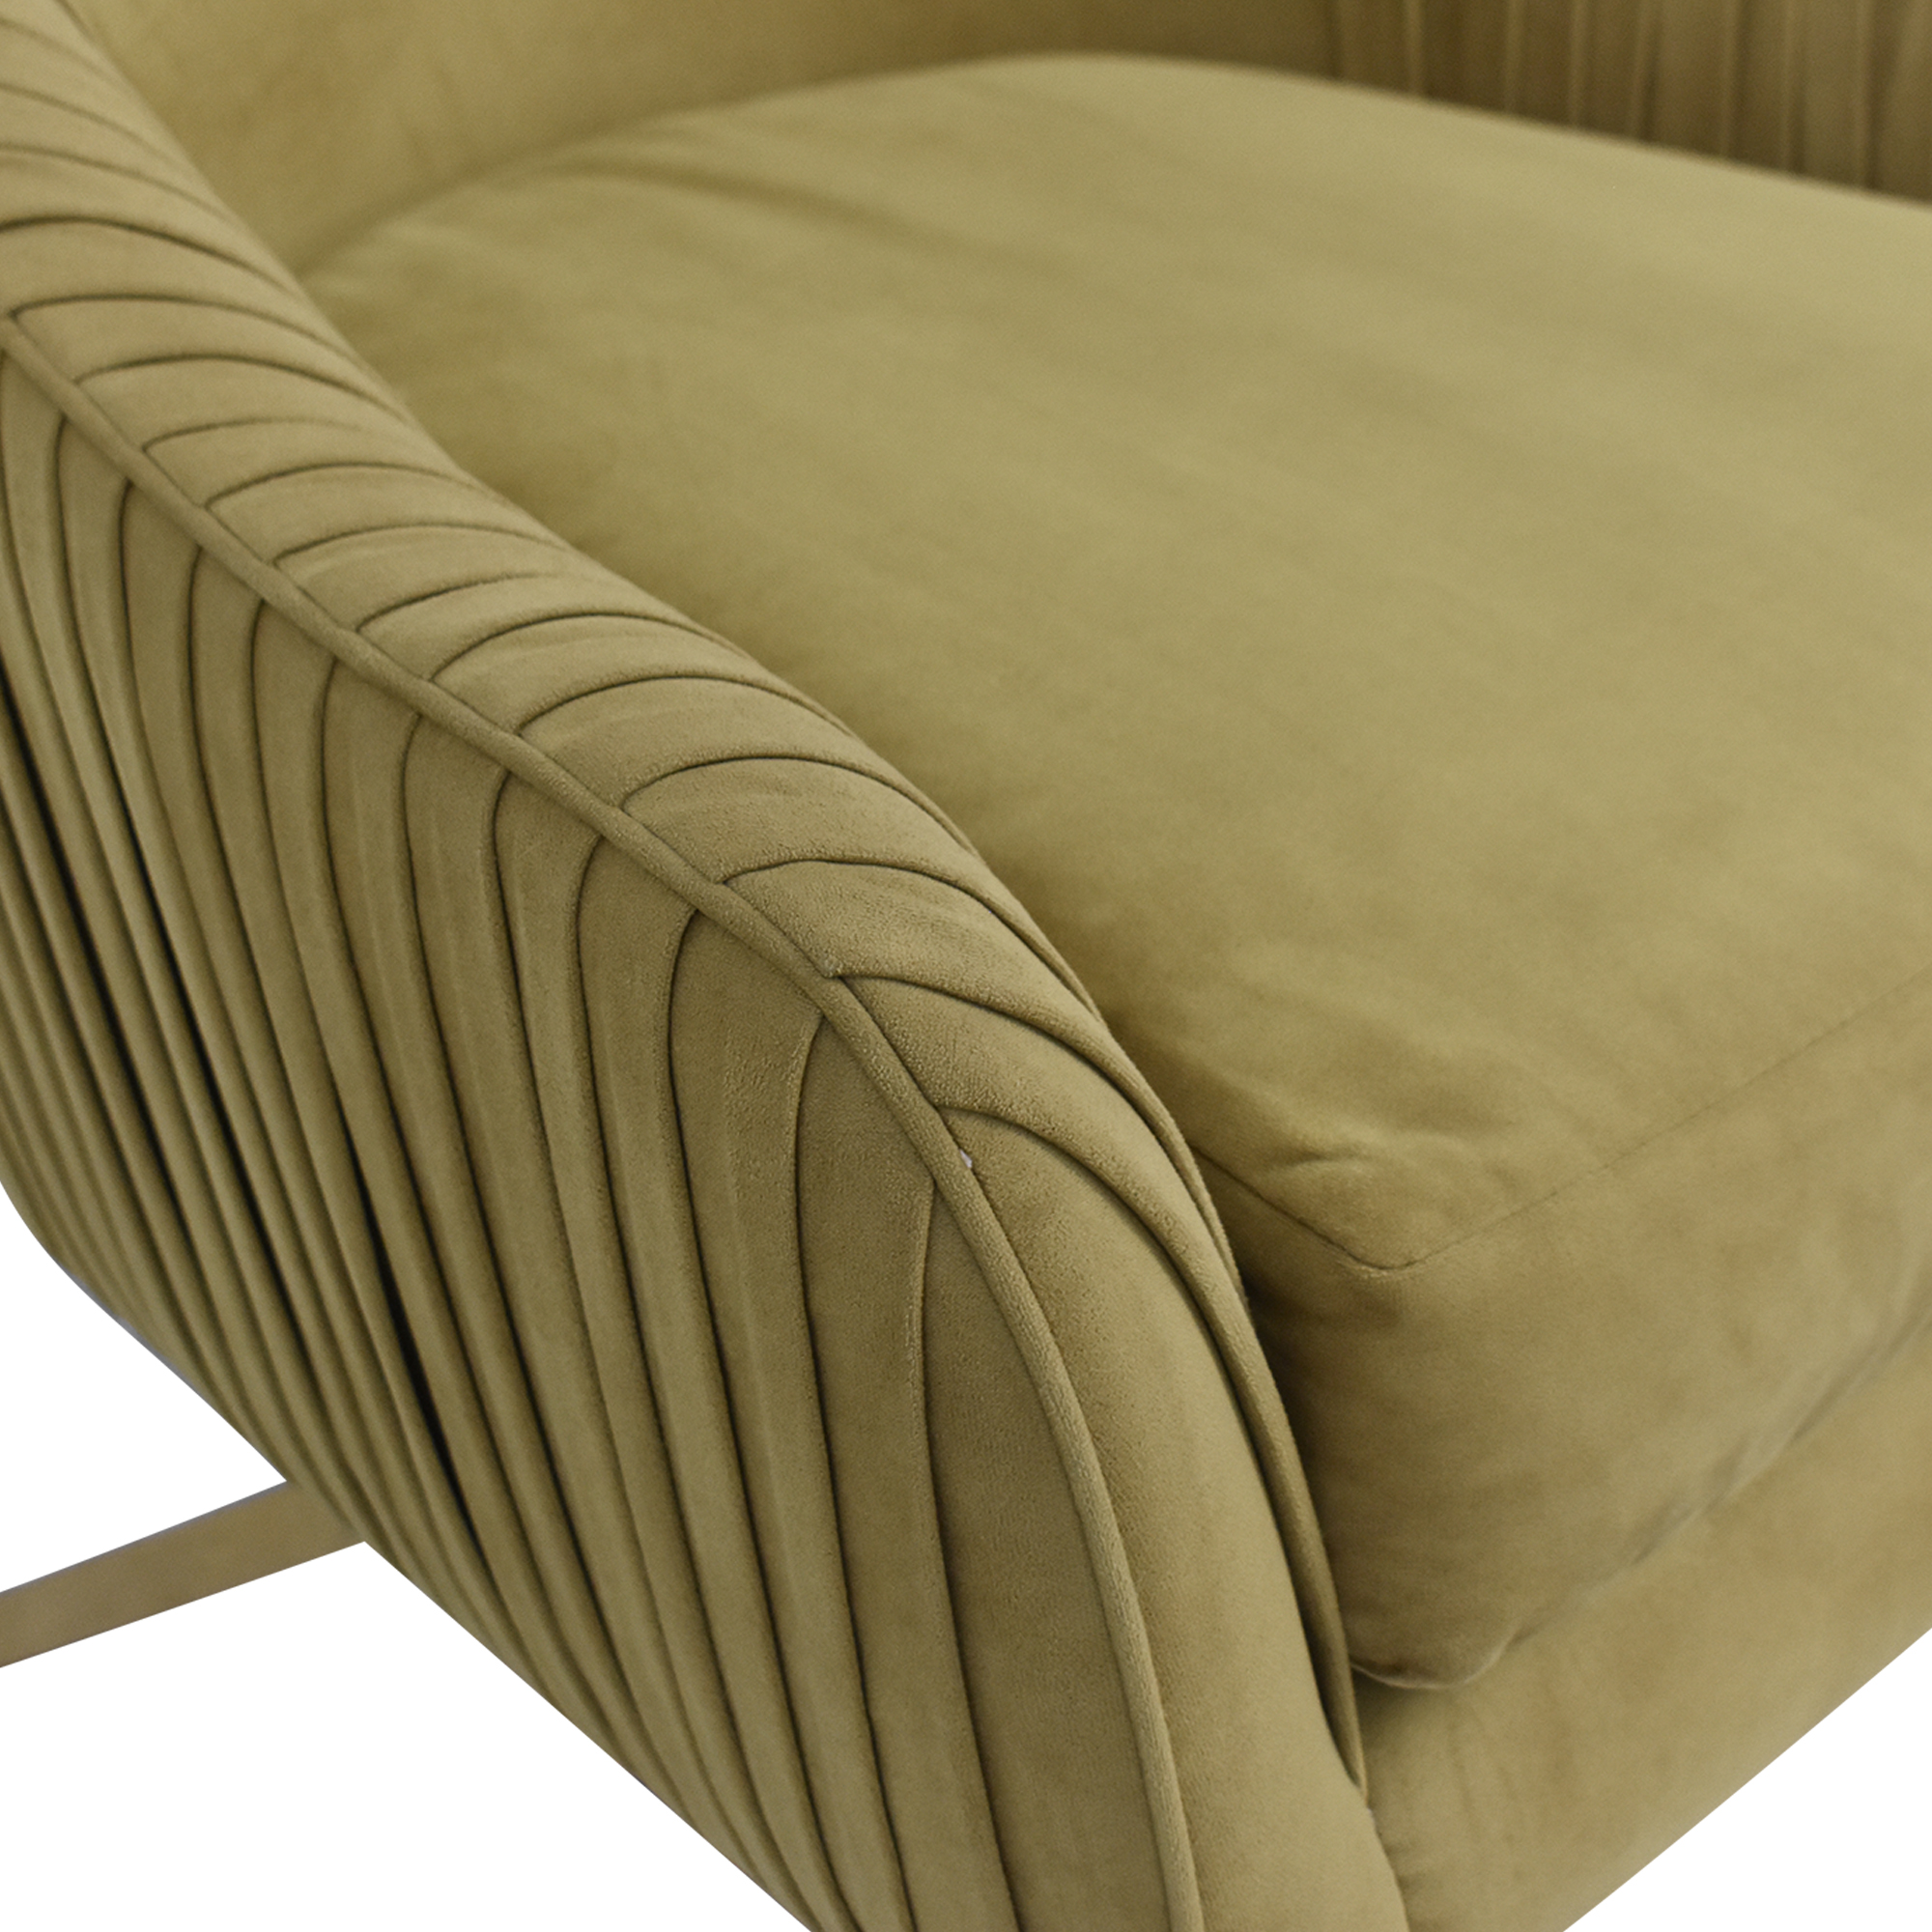 shop West Elm West Elm Roar & Rabbit Pleated Swivel Chair online